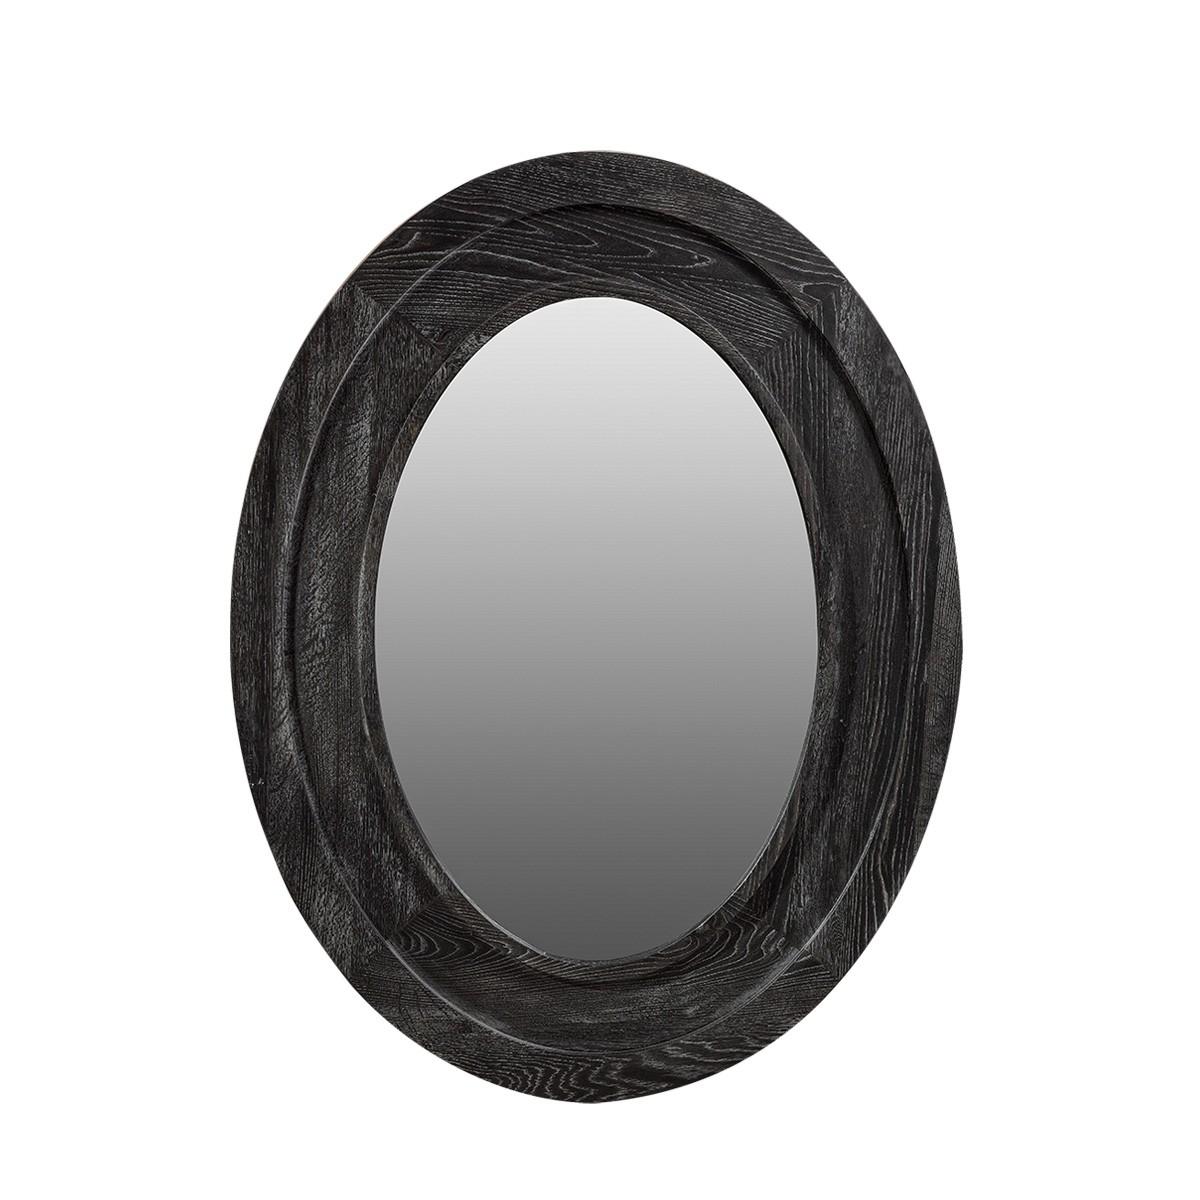 Классическое зеркало Olmetta Vintage Black Mirror-0